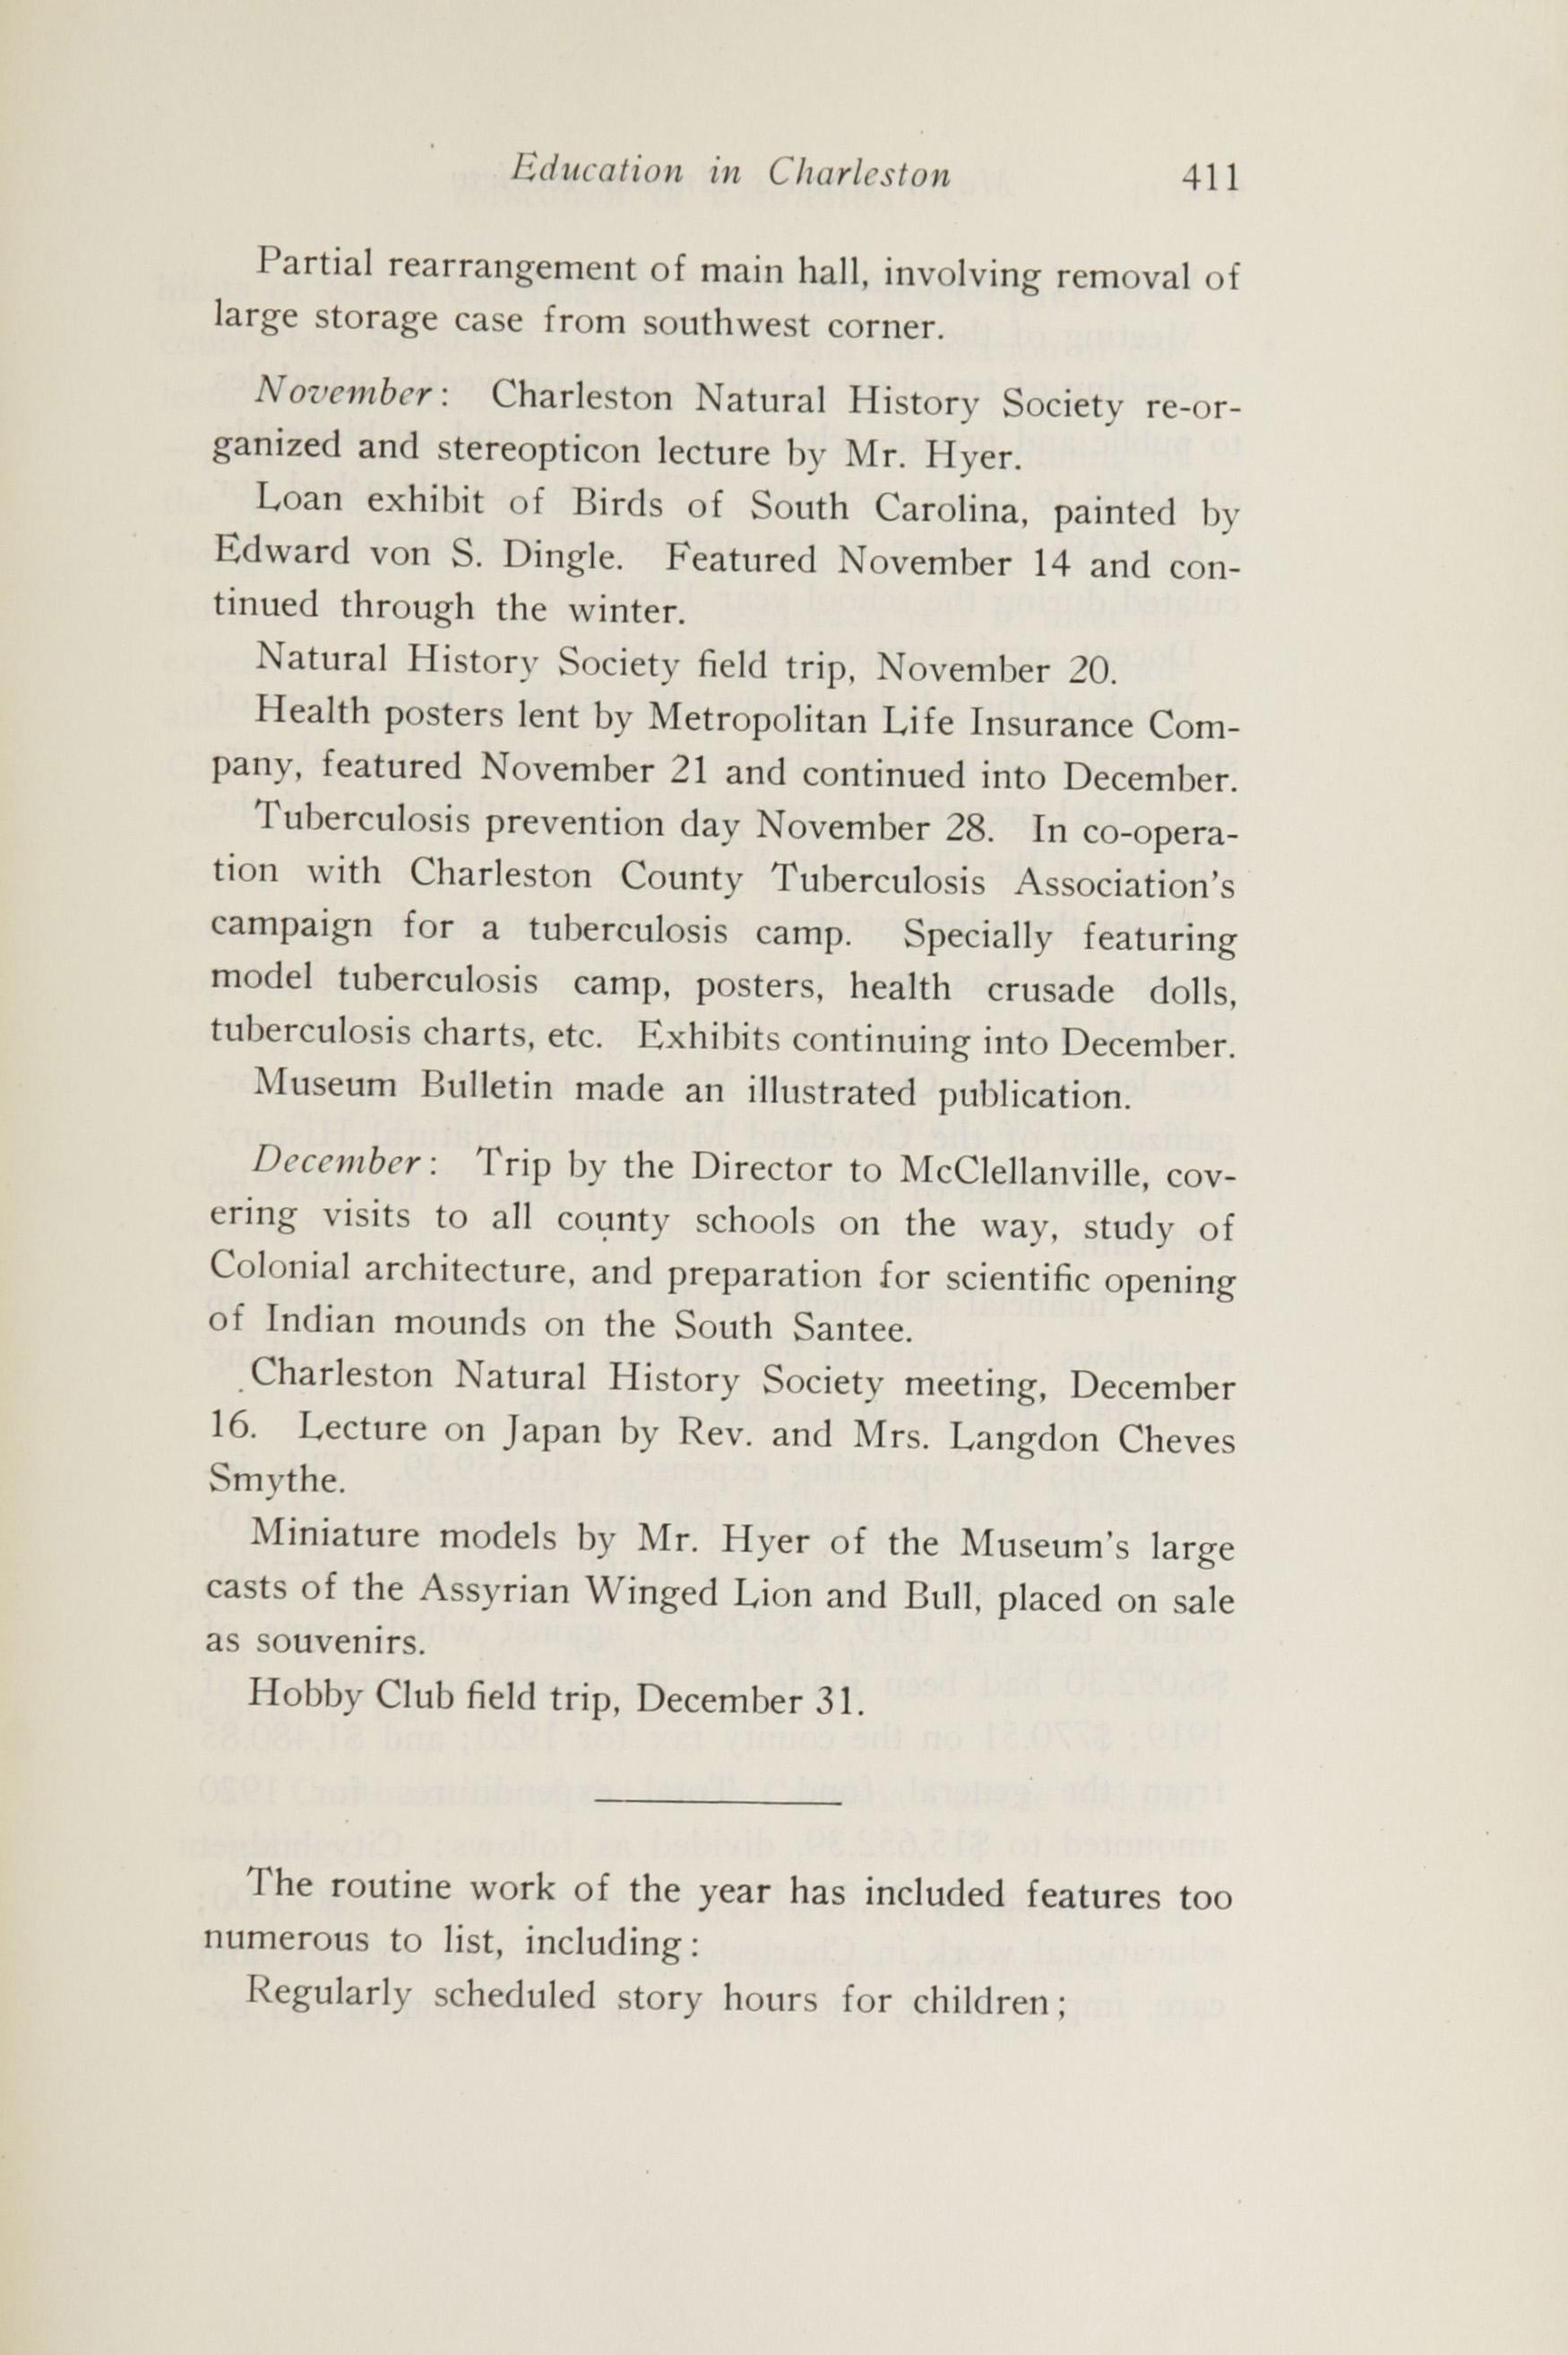 Charleston Yearbook, 1920, page 411